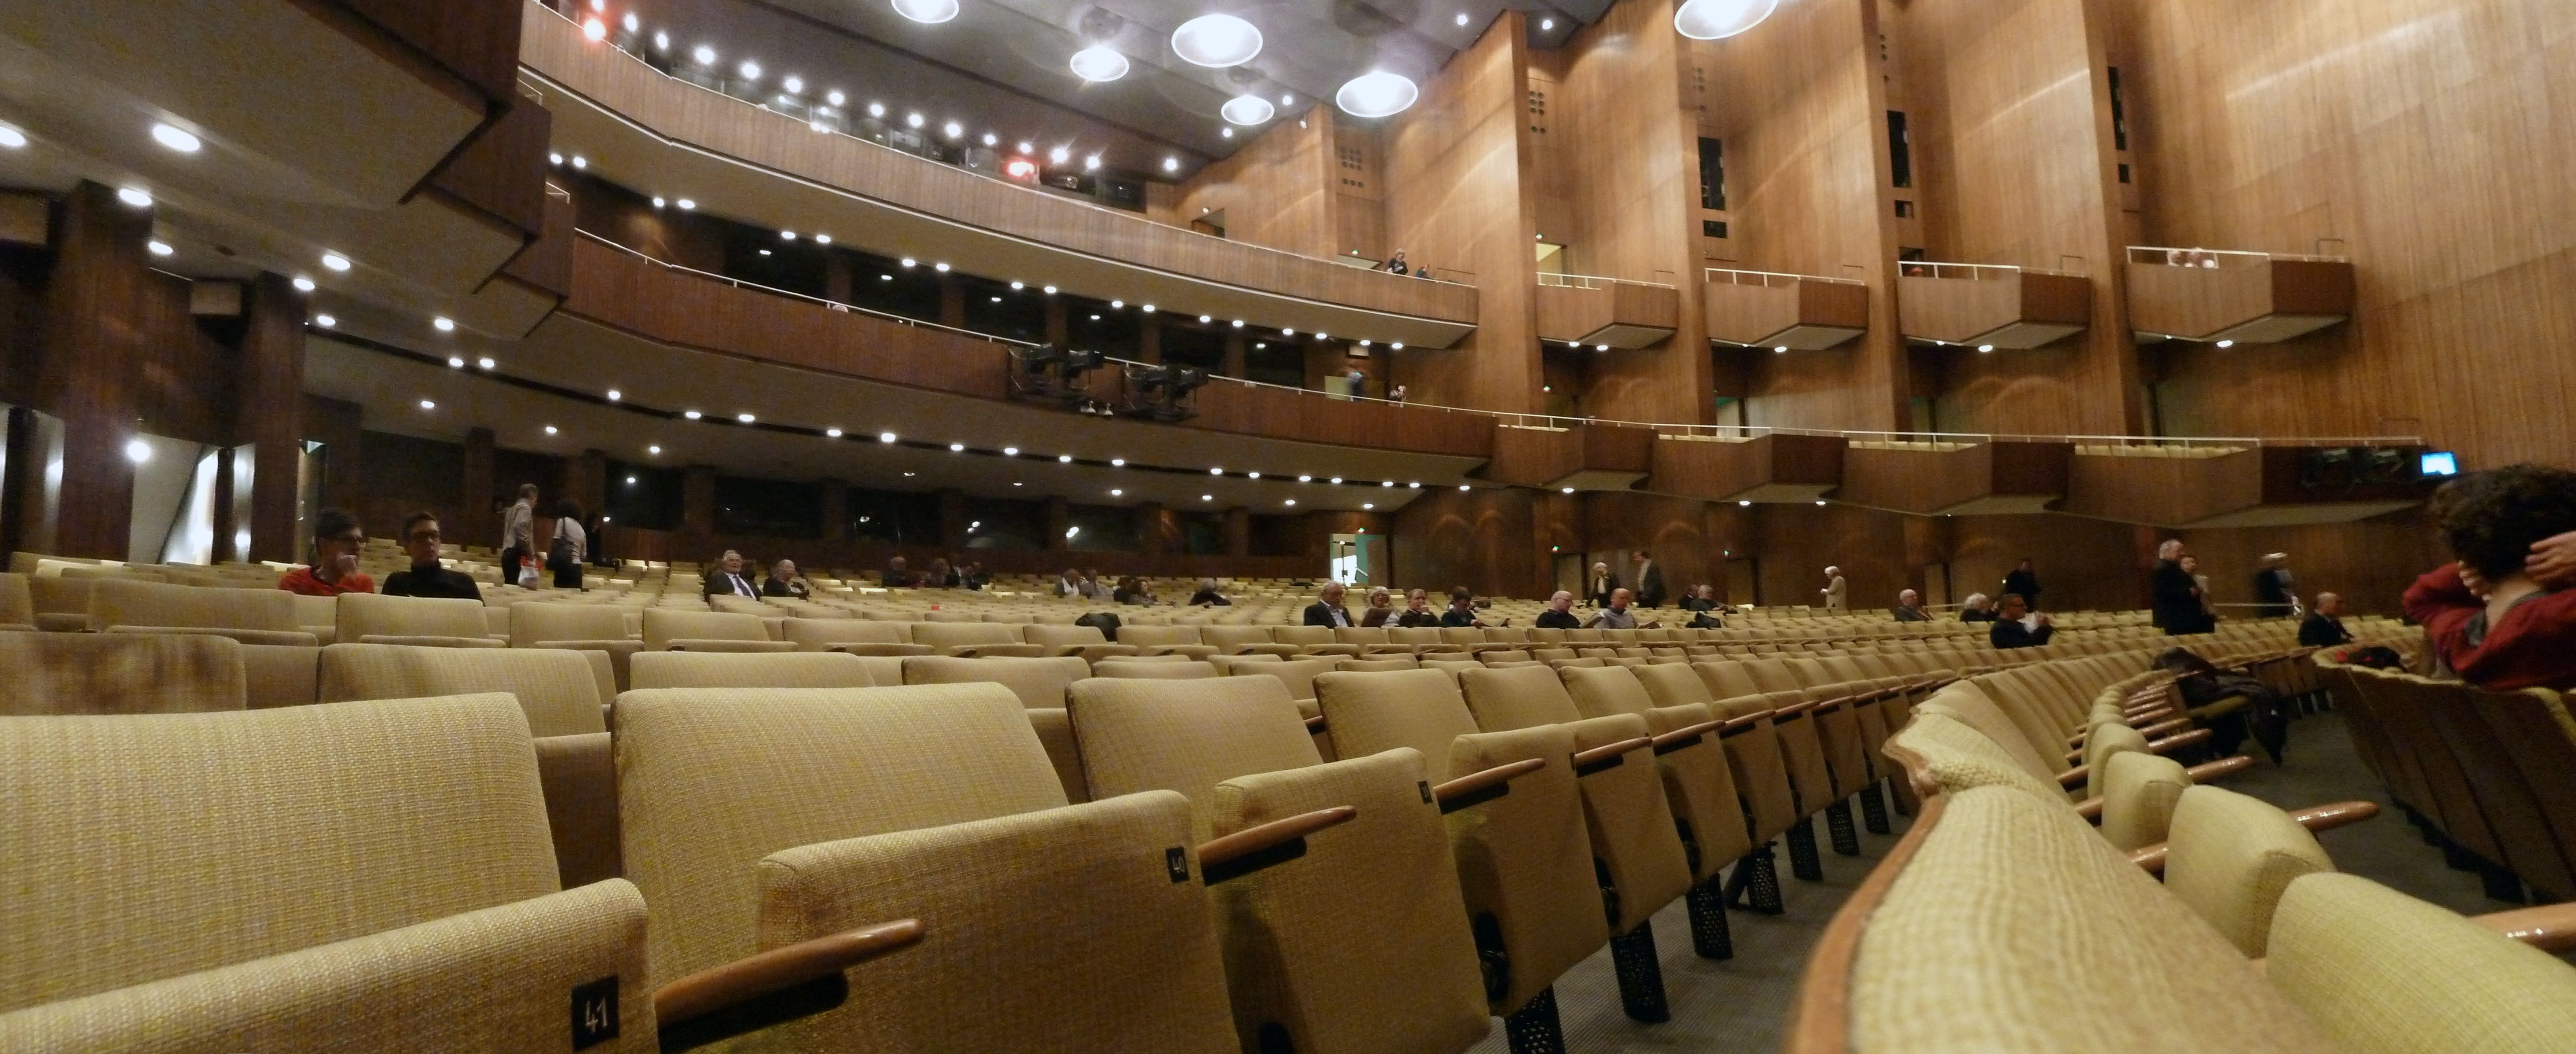 ENTERTAINMENT. Deutsche Oper Berlin. This opera company